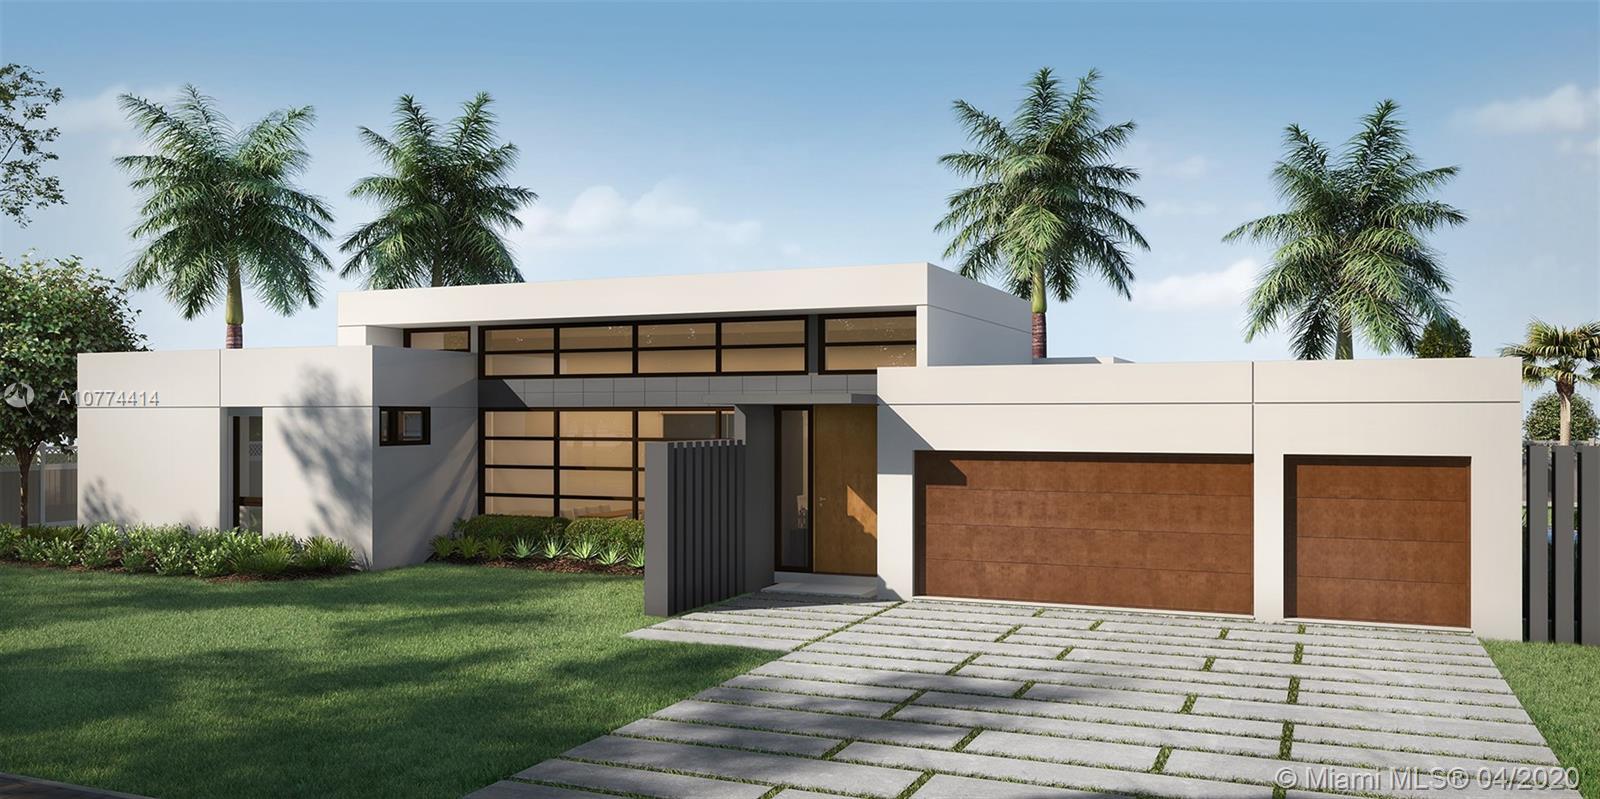 5800 Canal Drive # Lot 8, Lake Worth, FL 33463 - Lake Worth, FL real estate listing